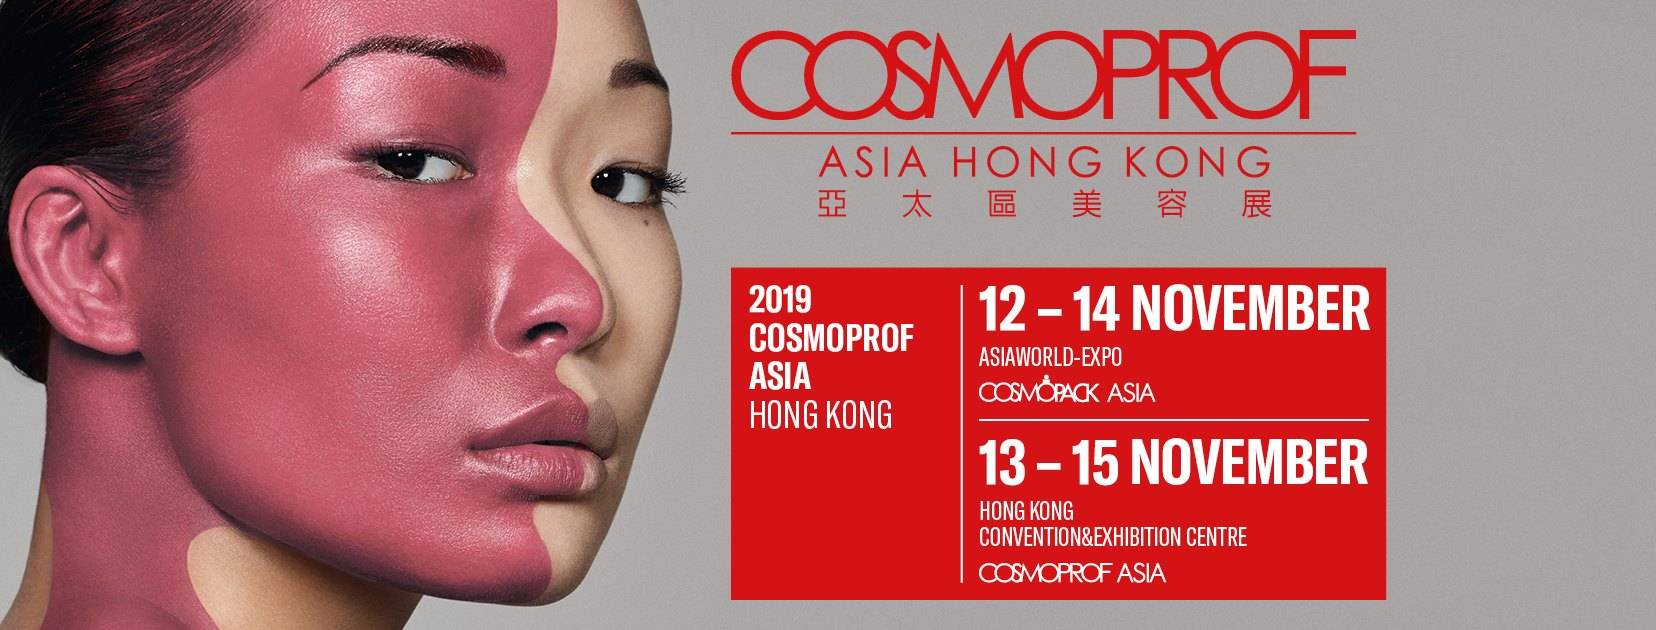 2019 CosmoprofAsia